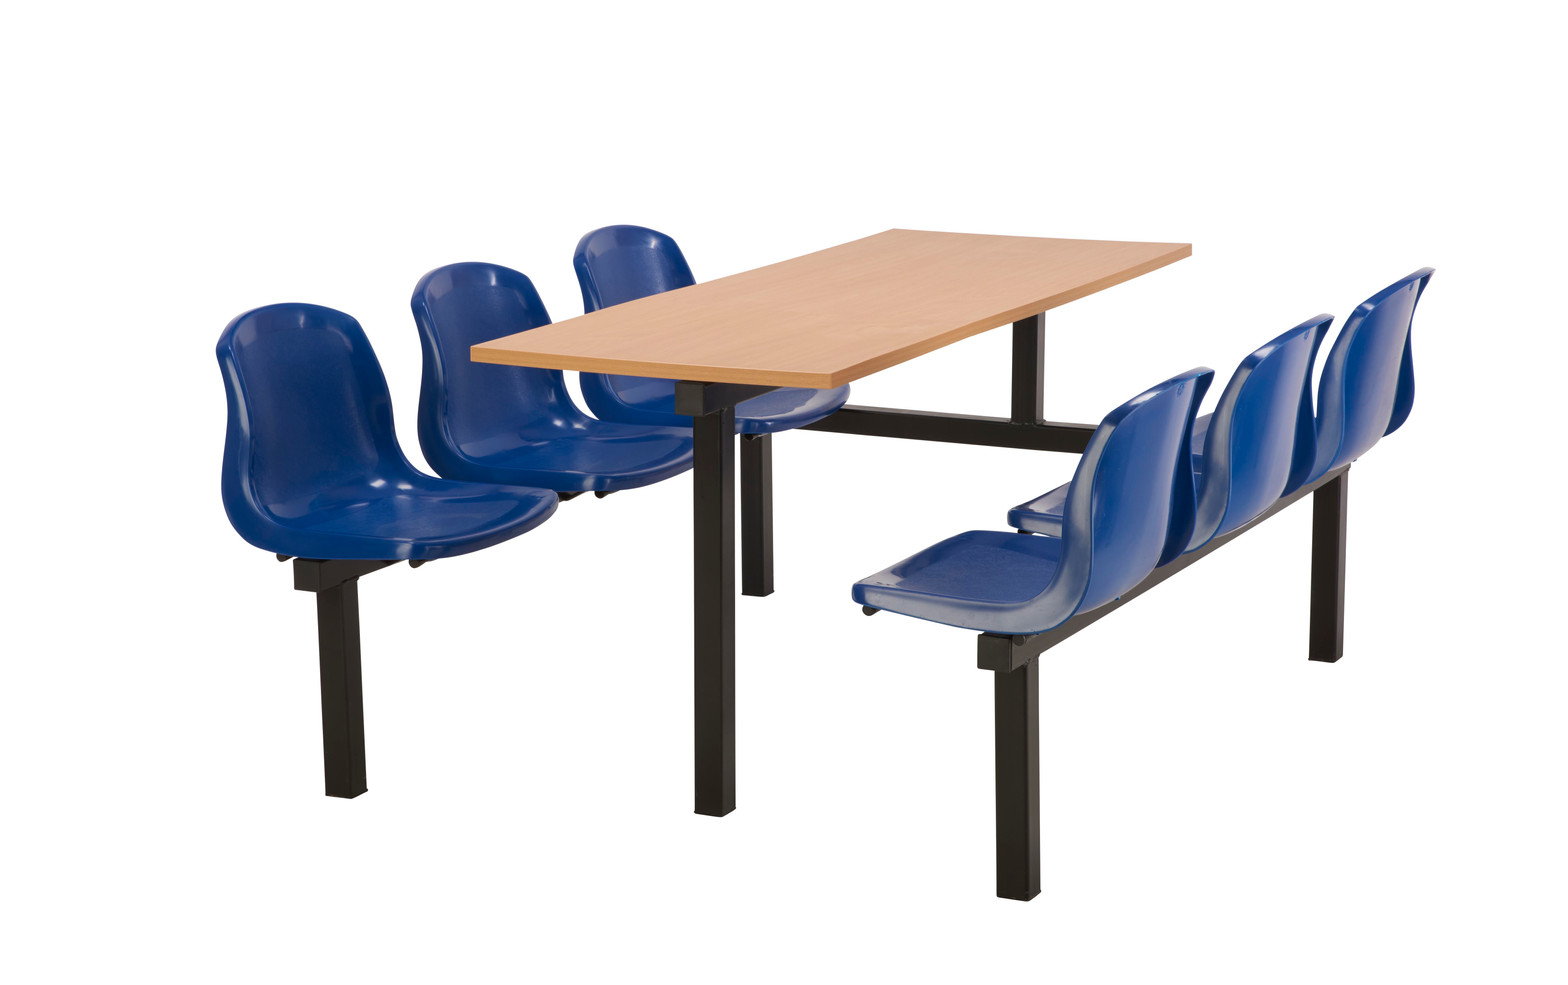 CU90-6S1-BLUE - BEECH